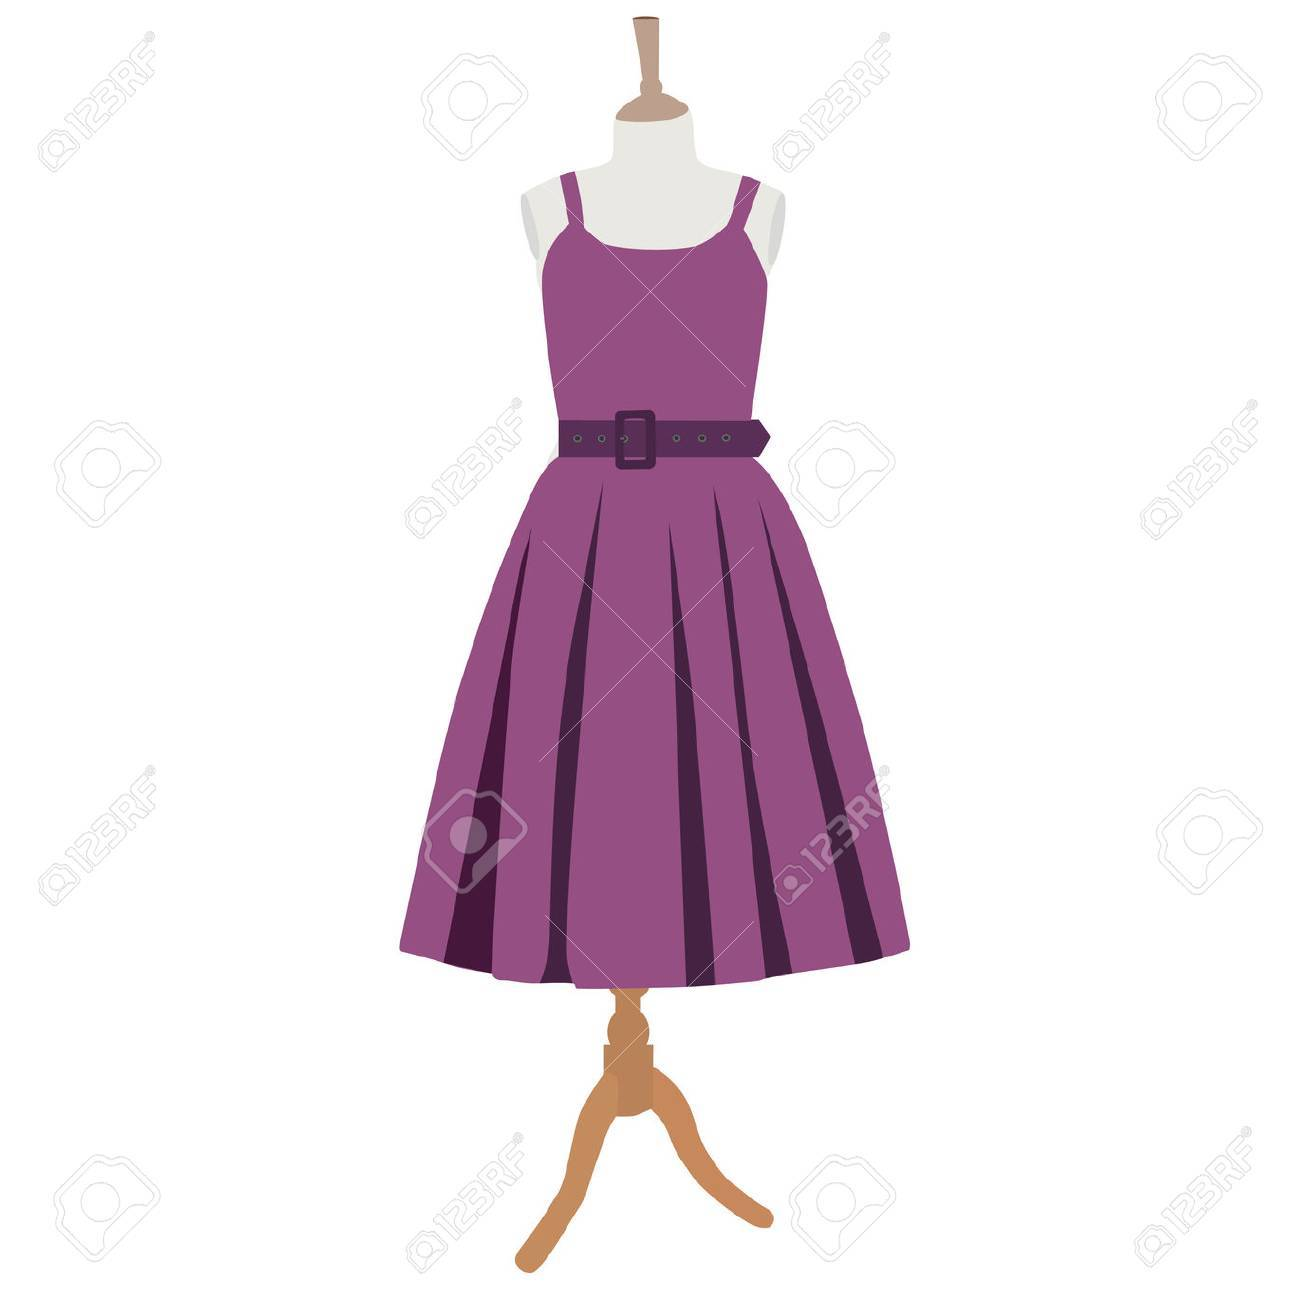 Vestido Púrpura, Sobre Maniquí Vestido, La Ropa, La Vendimia Fotos ...